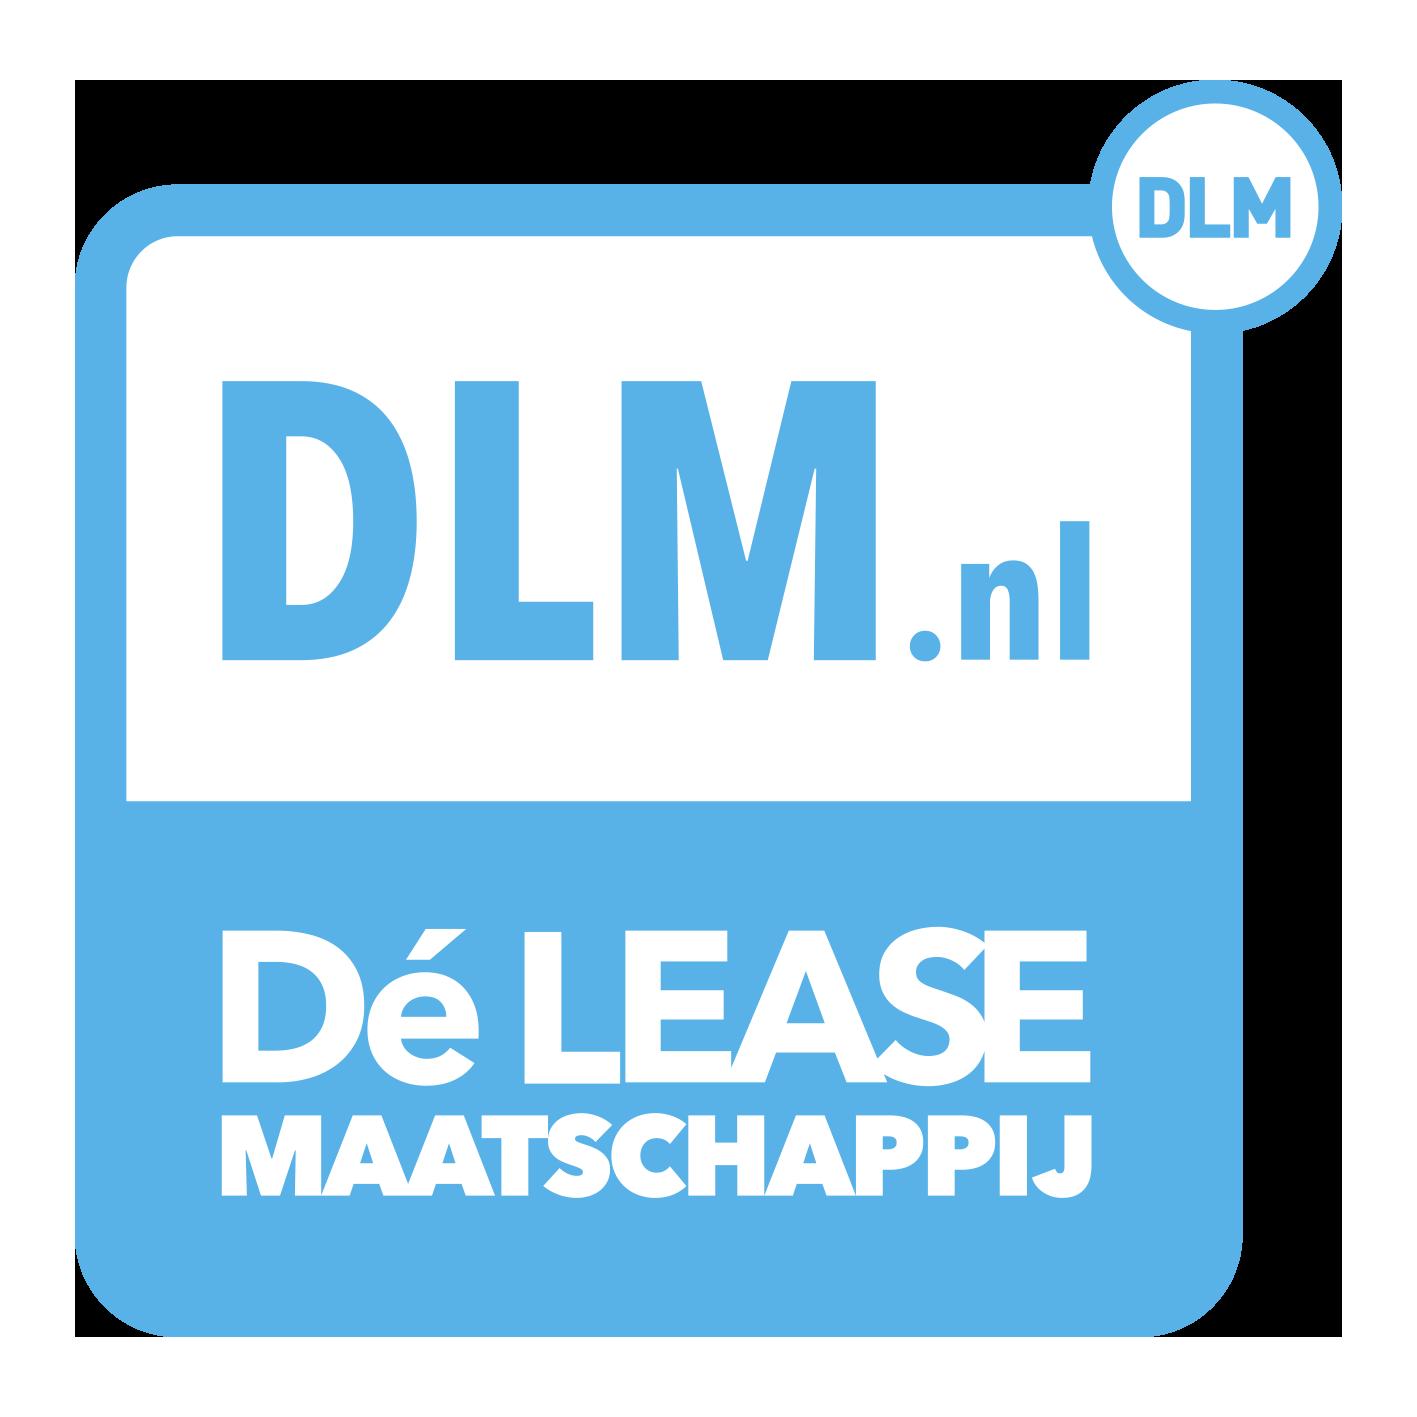 dlm_voorstel-c2